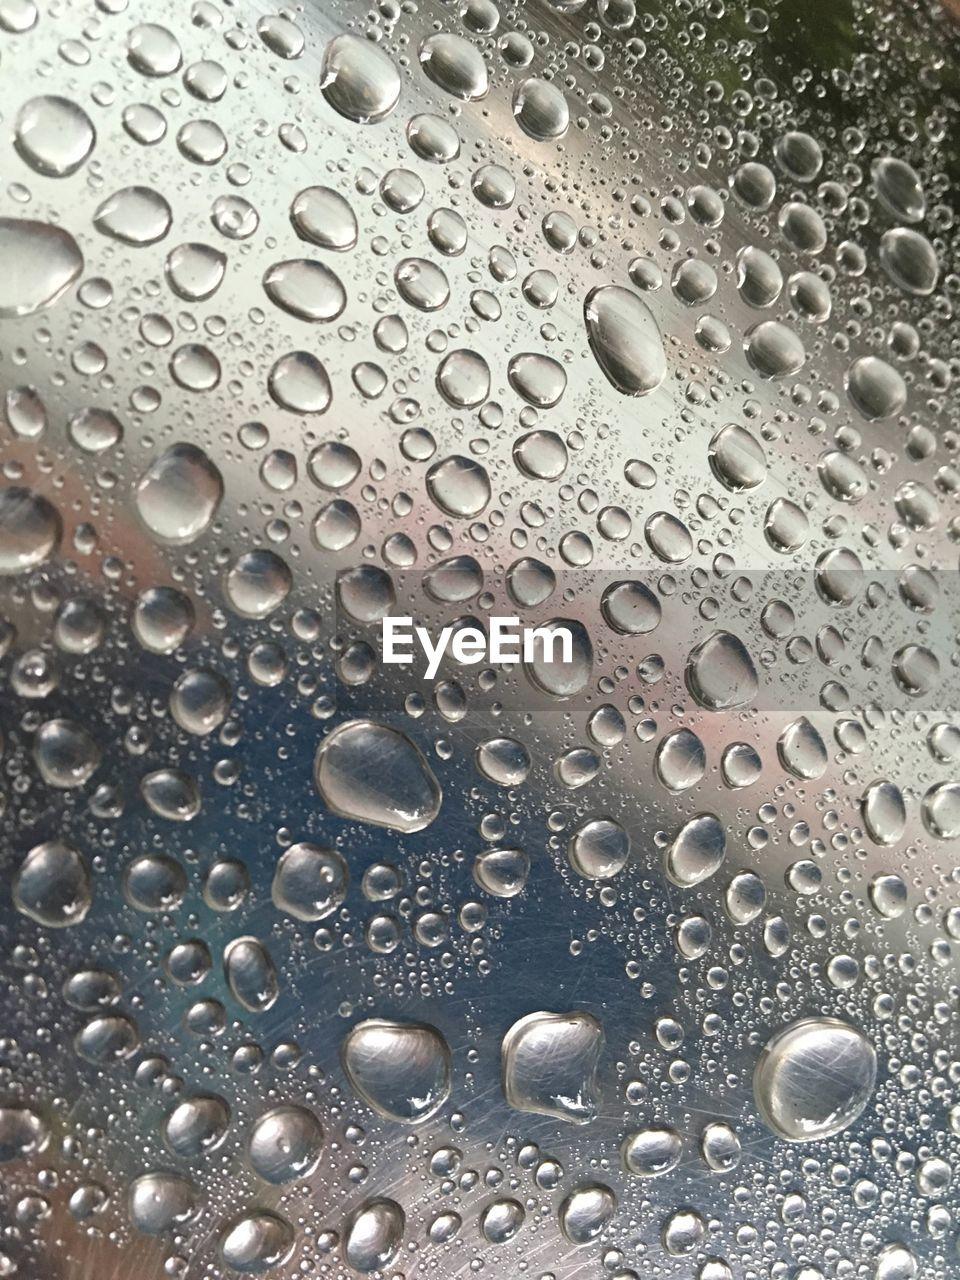 Full frame shot of glass with raindrops